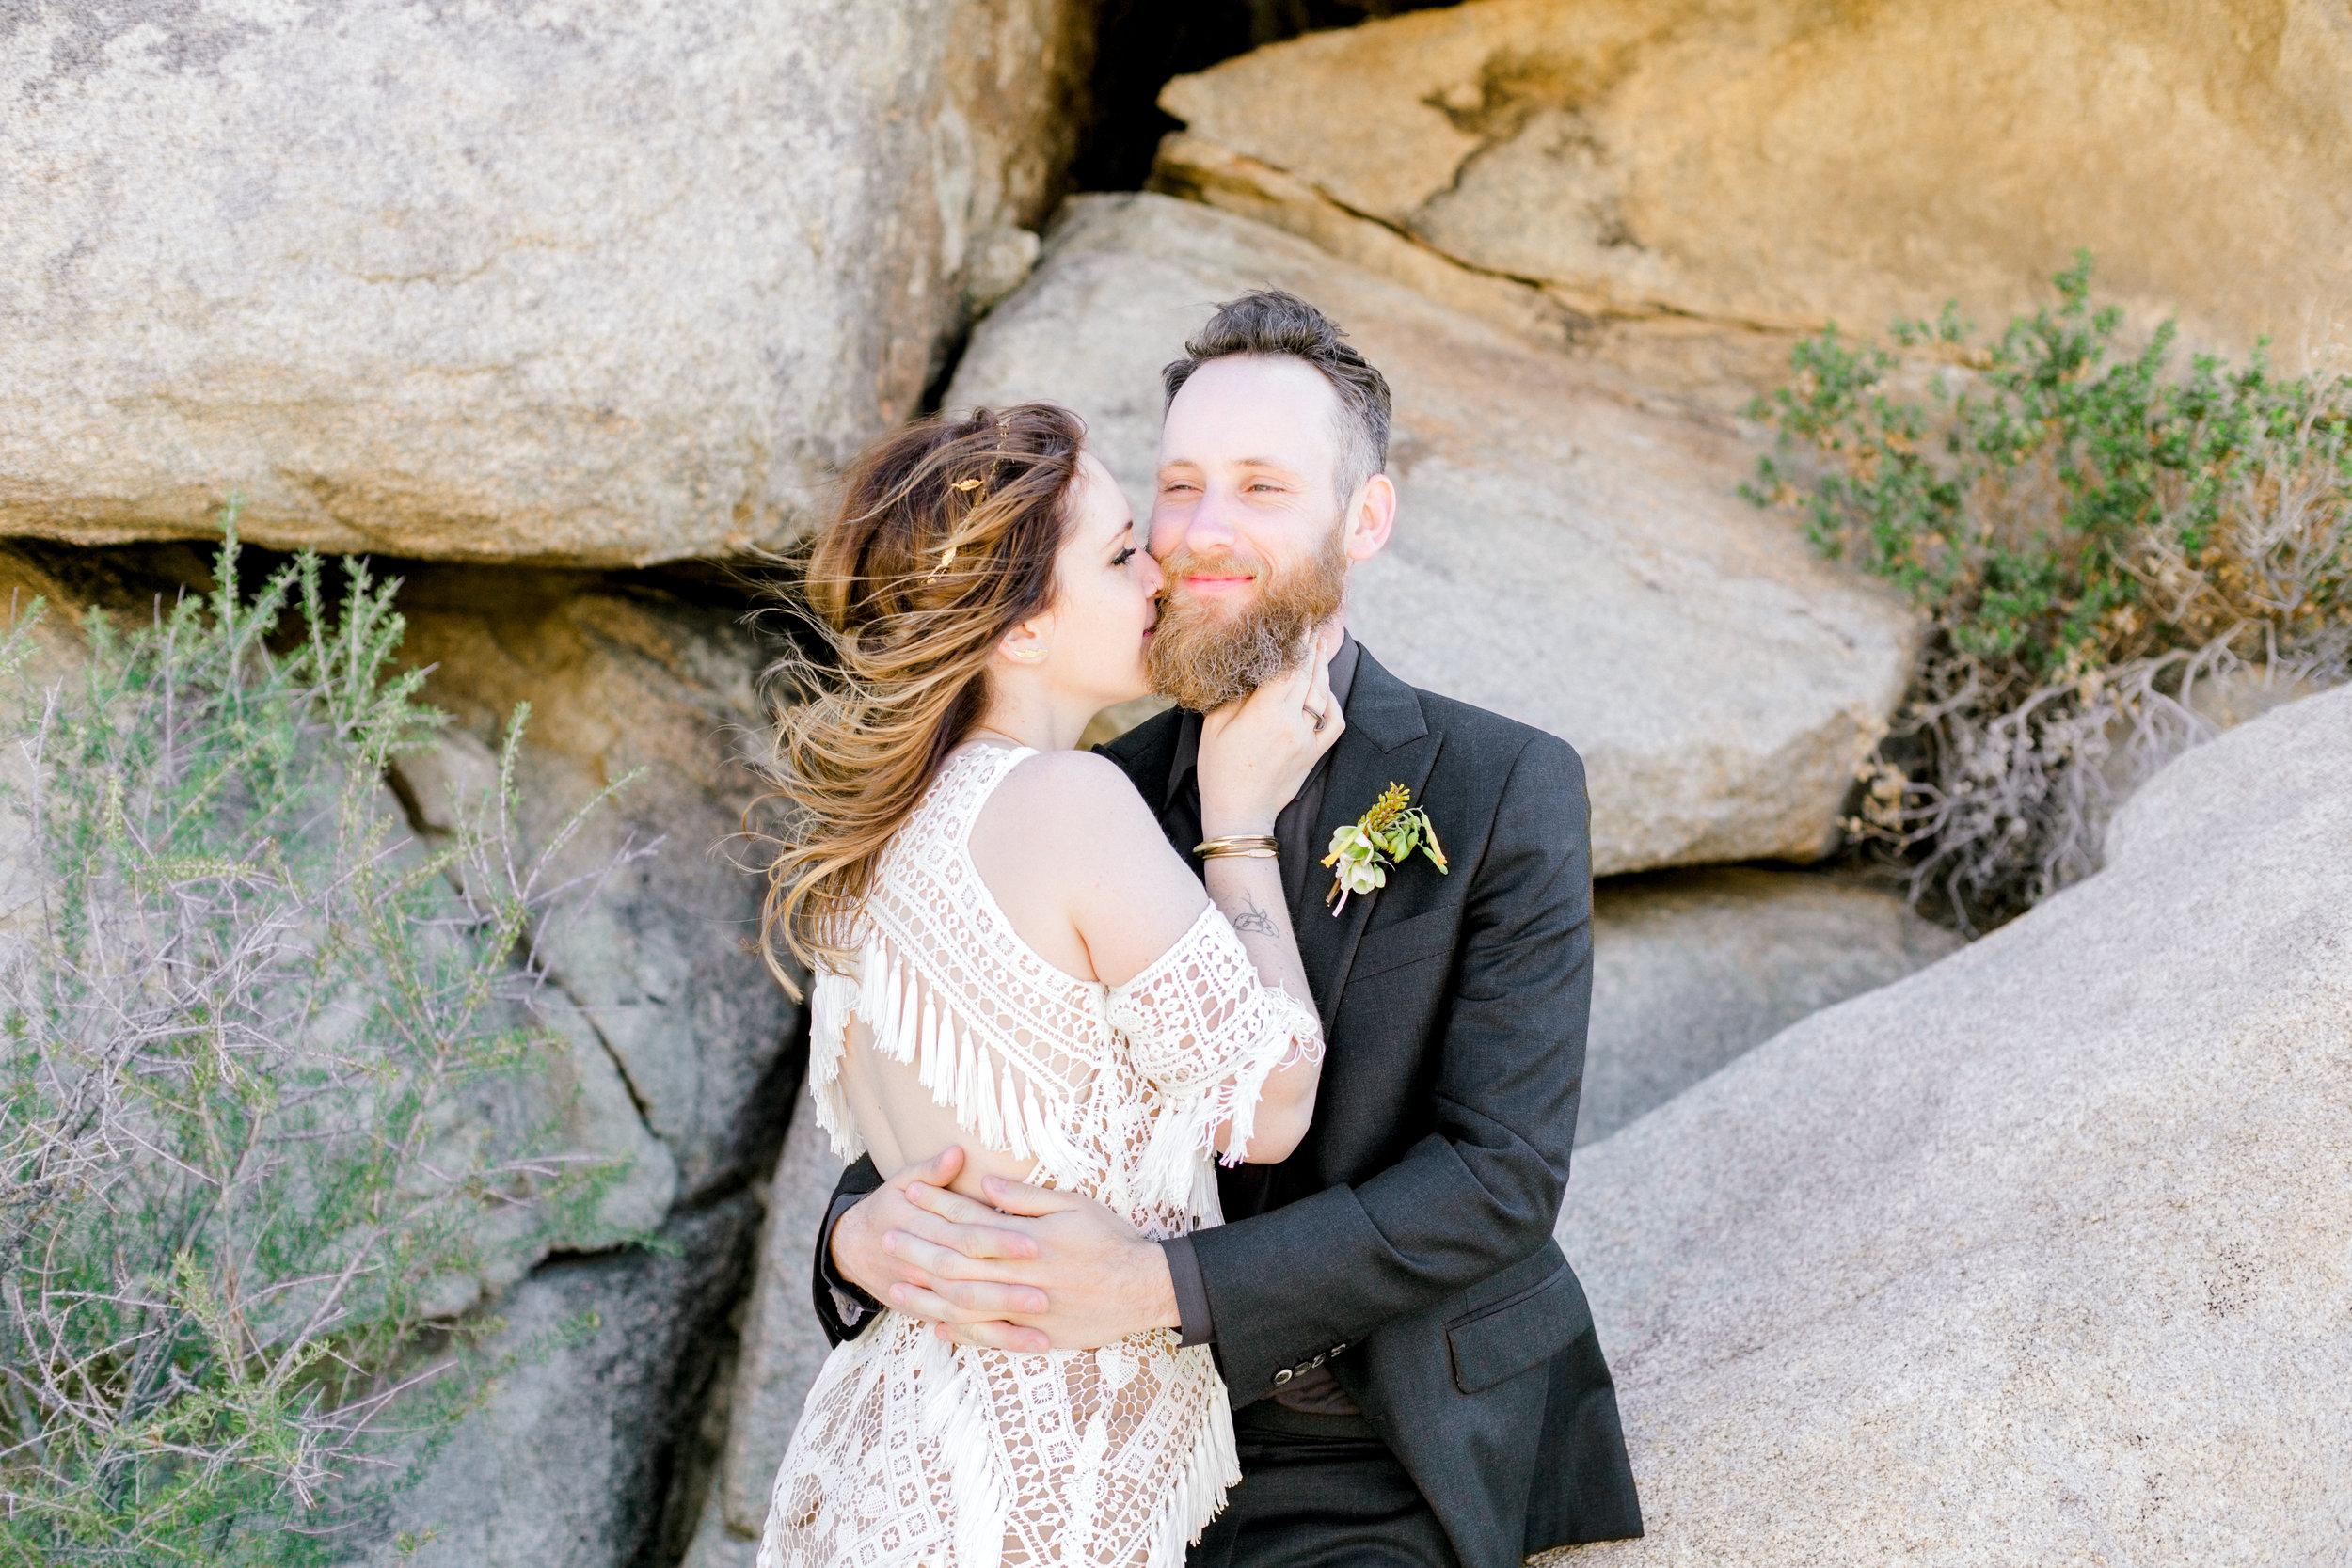 jessica sgubin photography atlanta portrait photographer engagement family couple wedding joshua tree wedding elopement-1-6.jpg